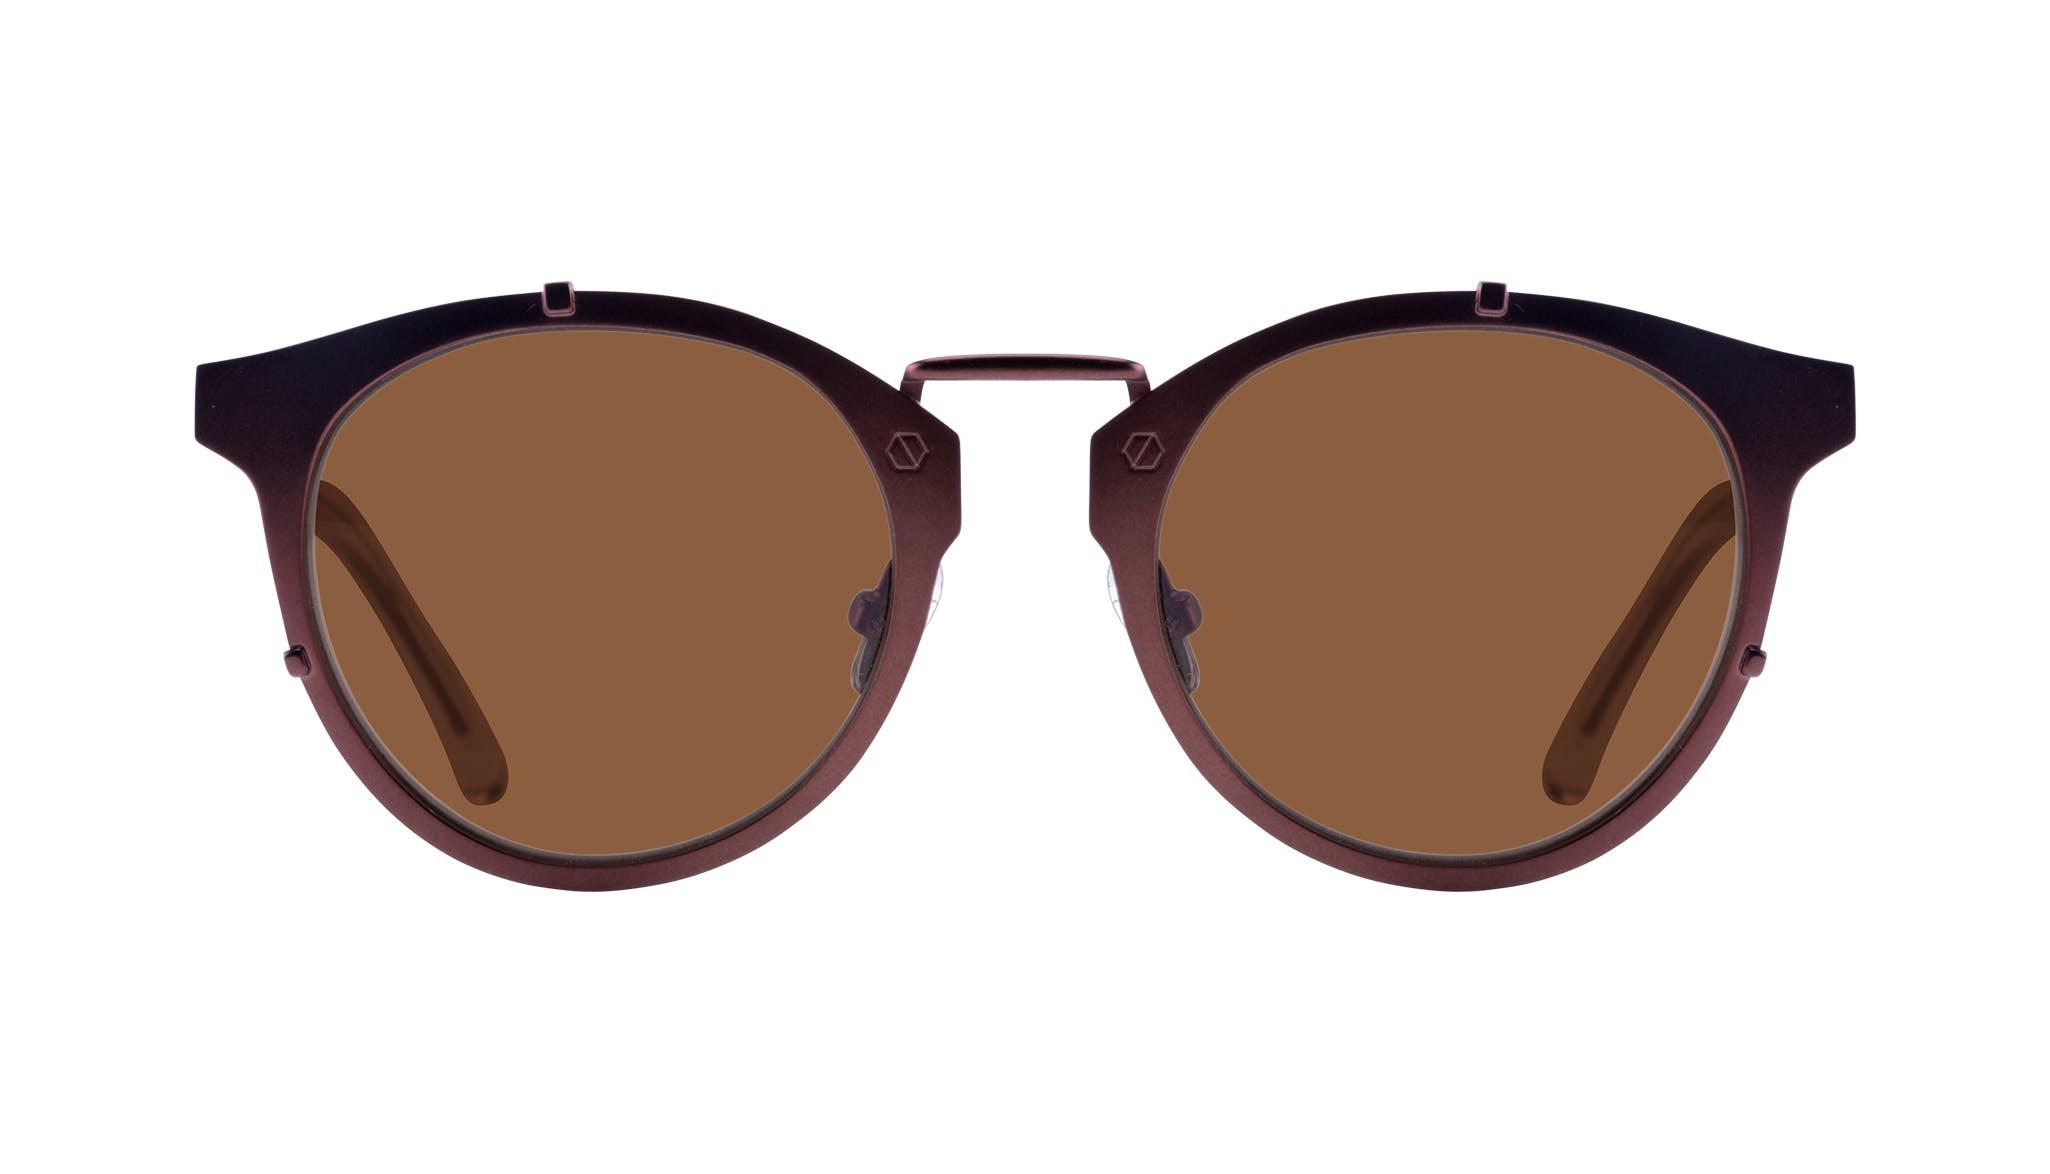 Affordable Fashion Glasses Round Sunglasses Men Way Mud